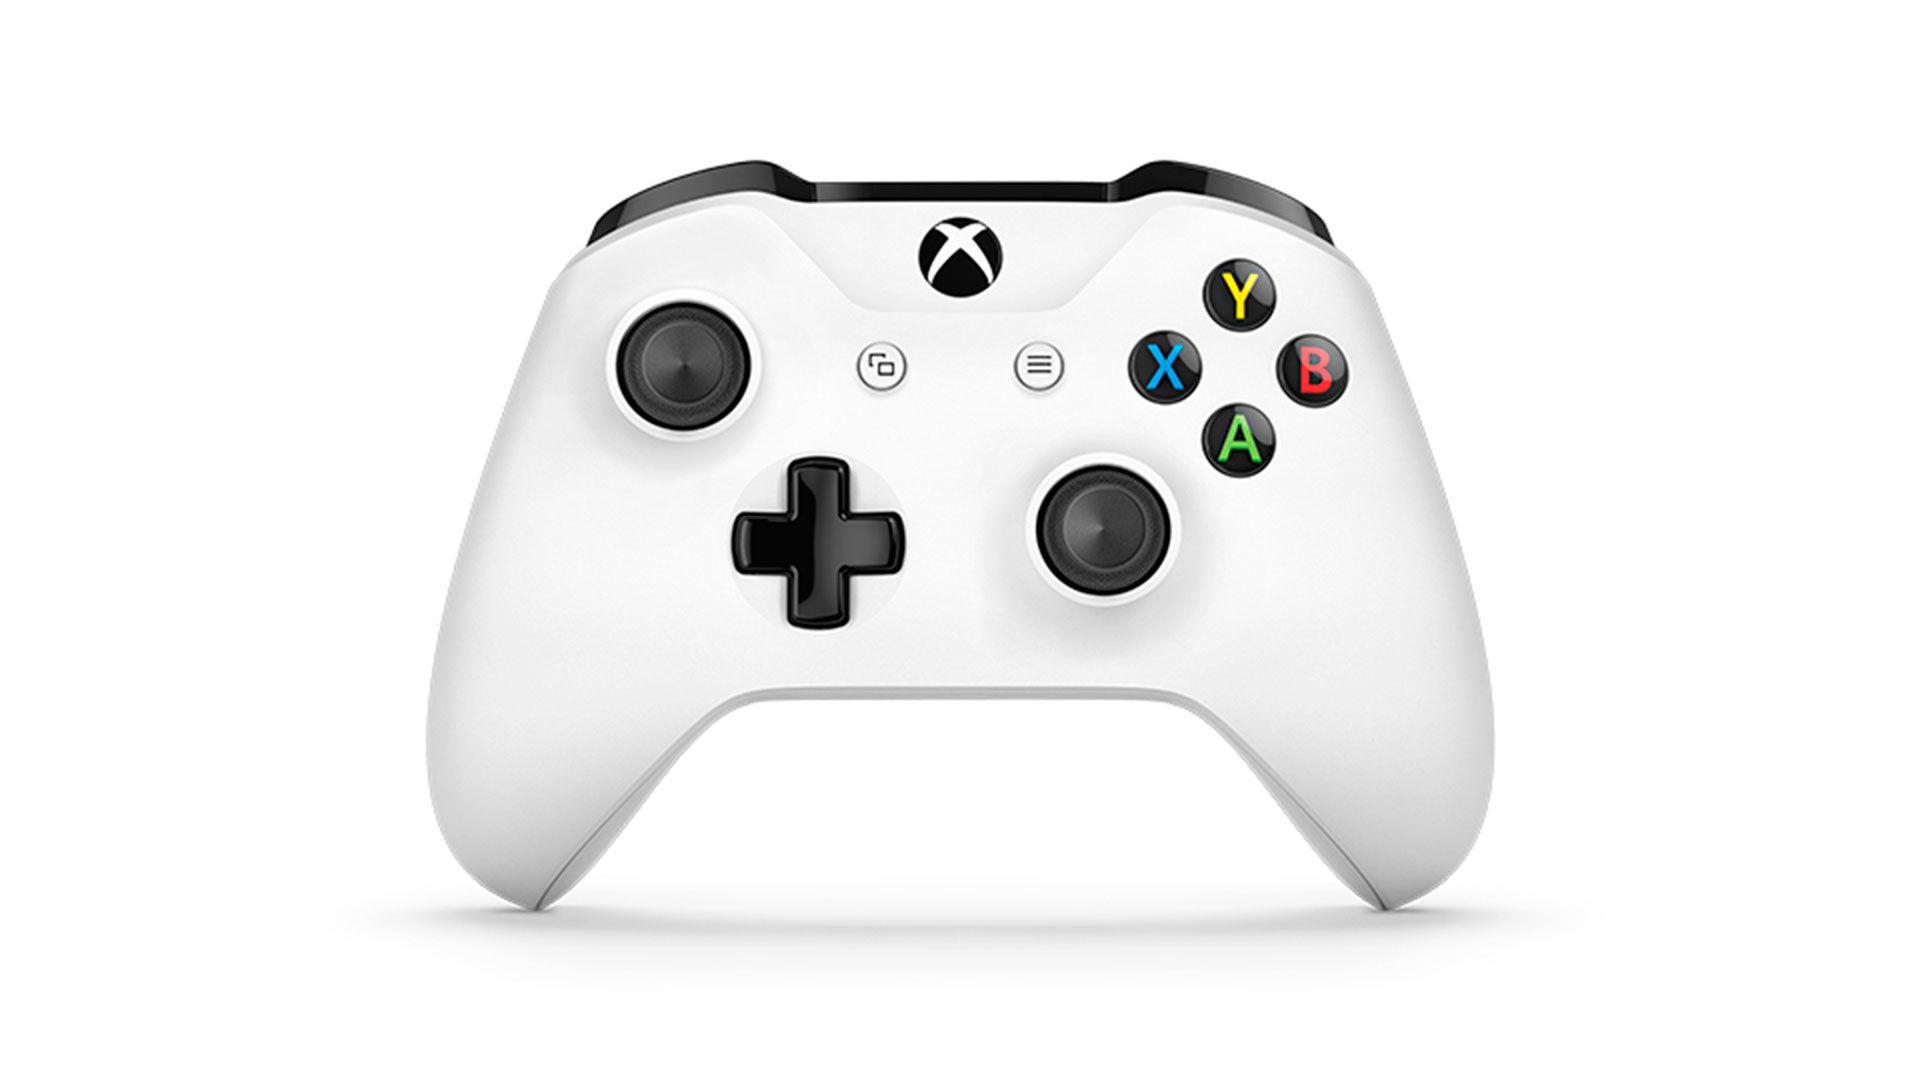 Xbox One белый геймпад изображение 0